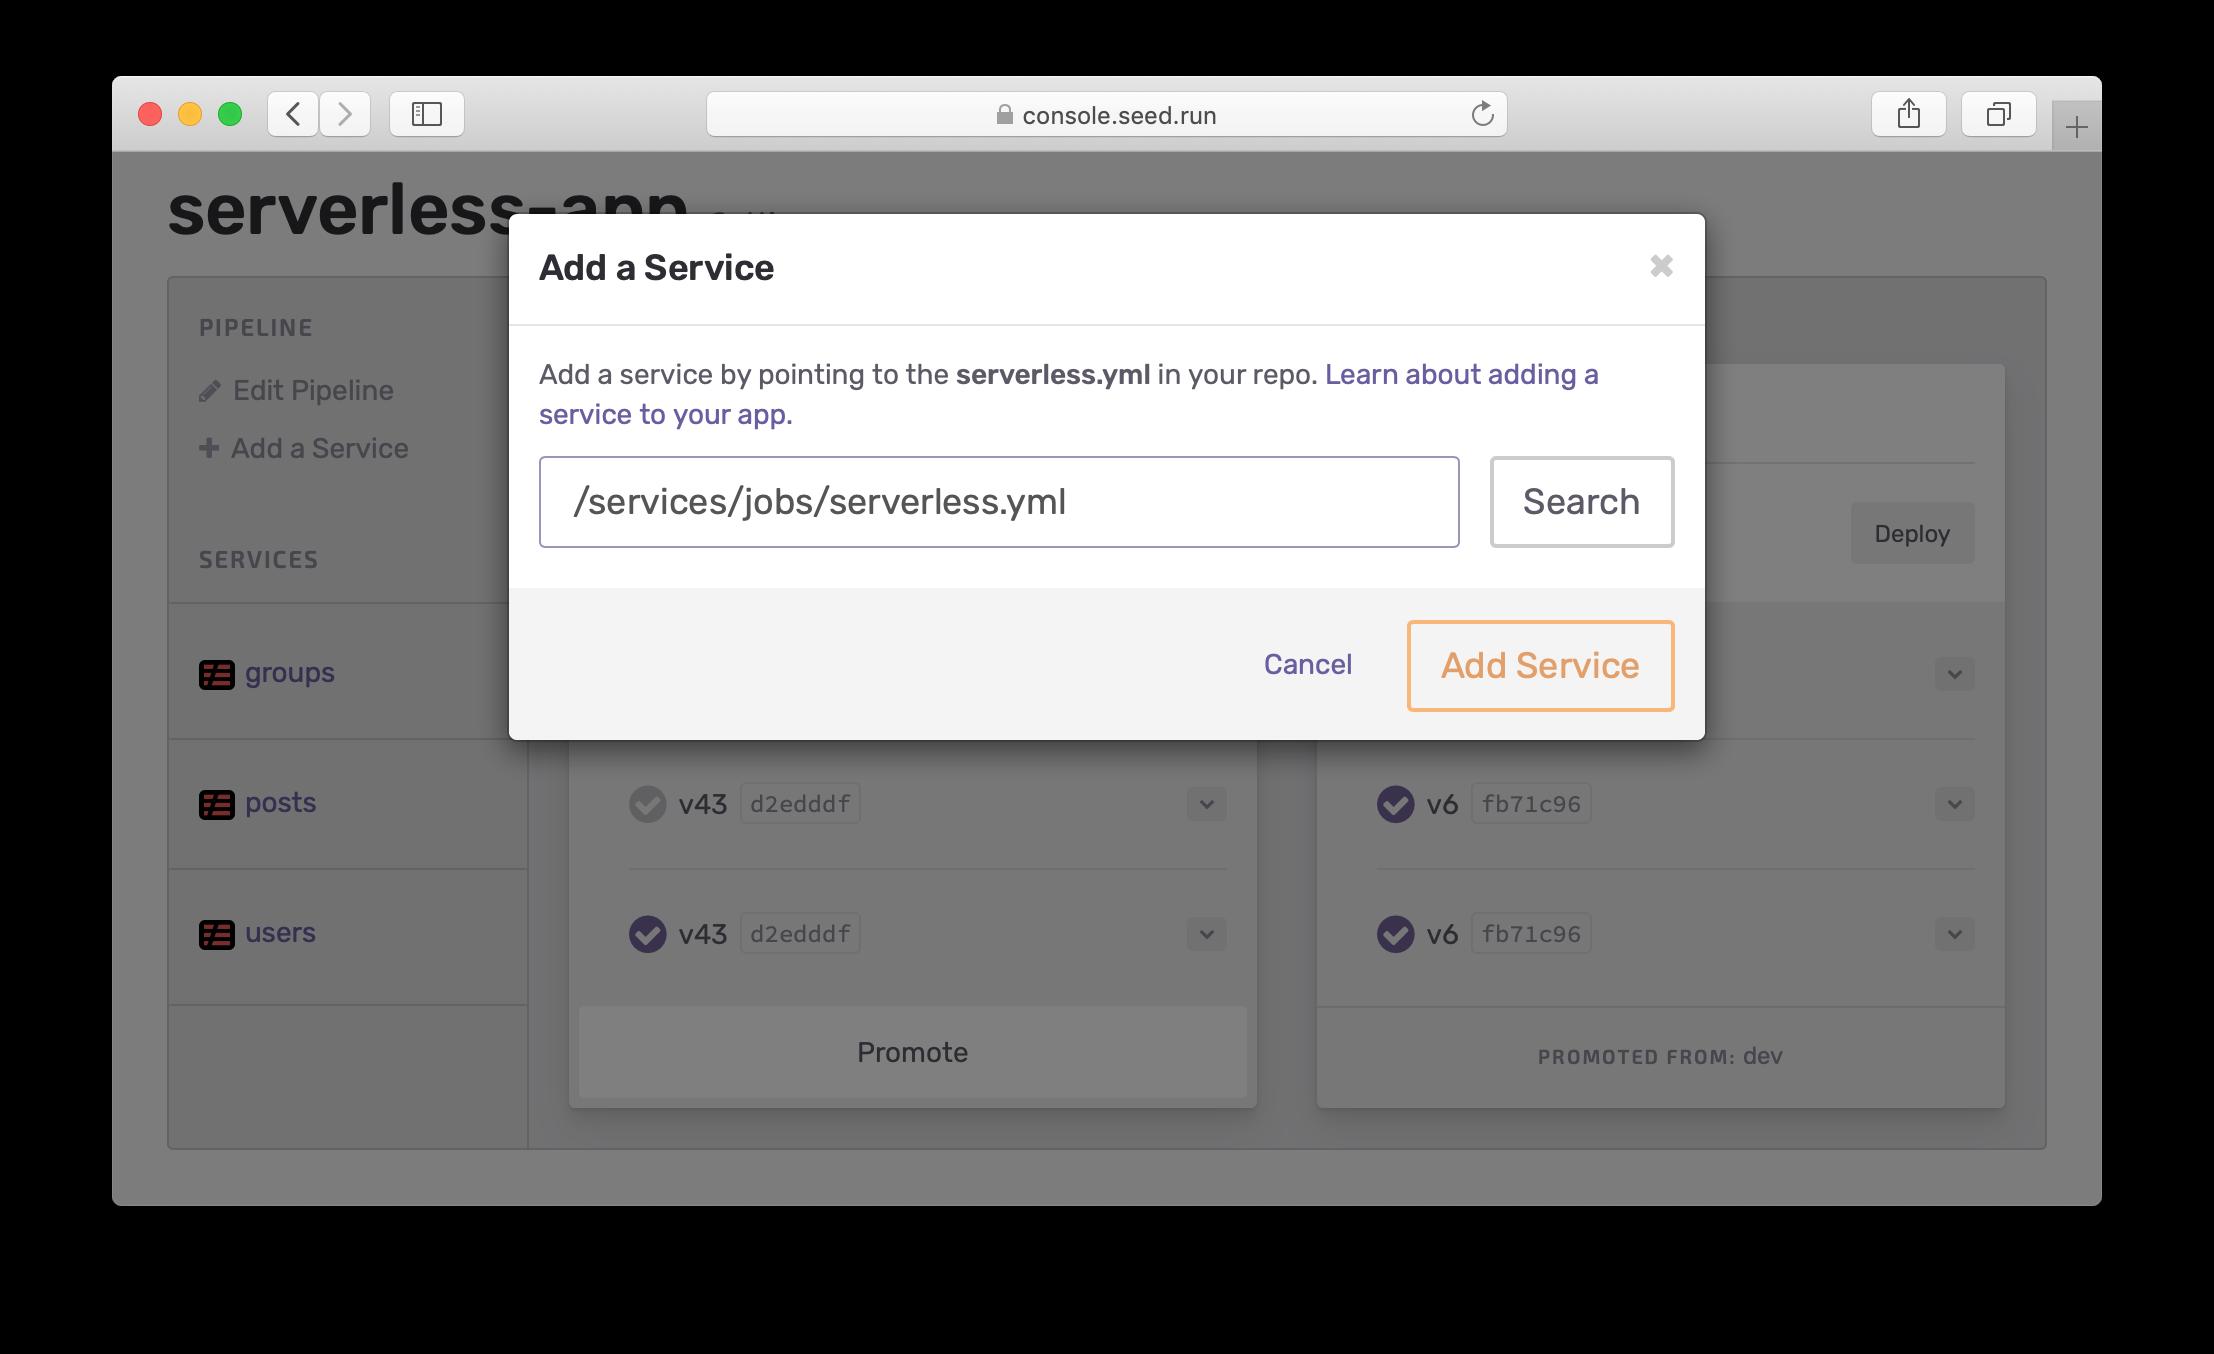 Add service modal